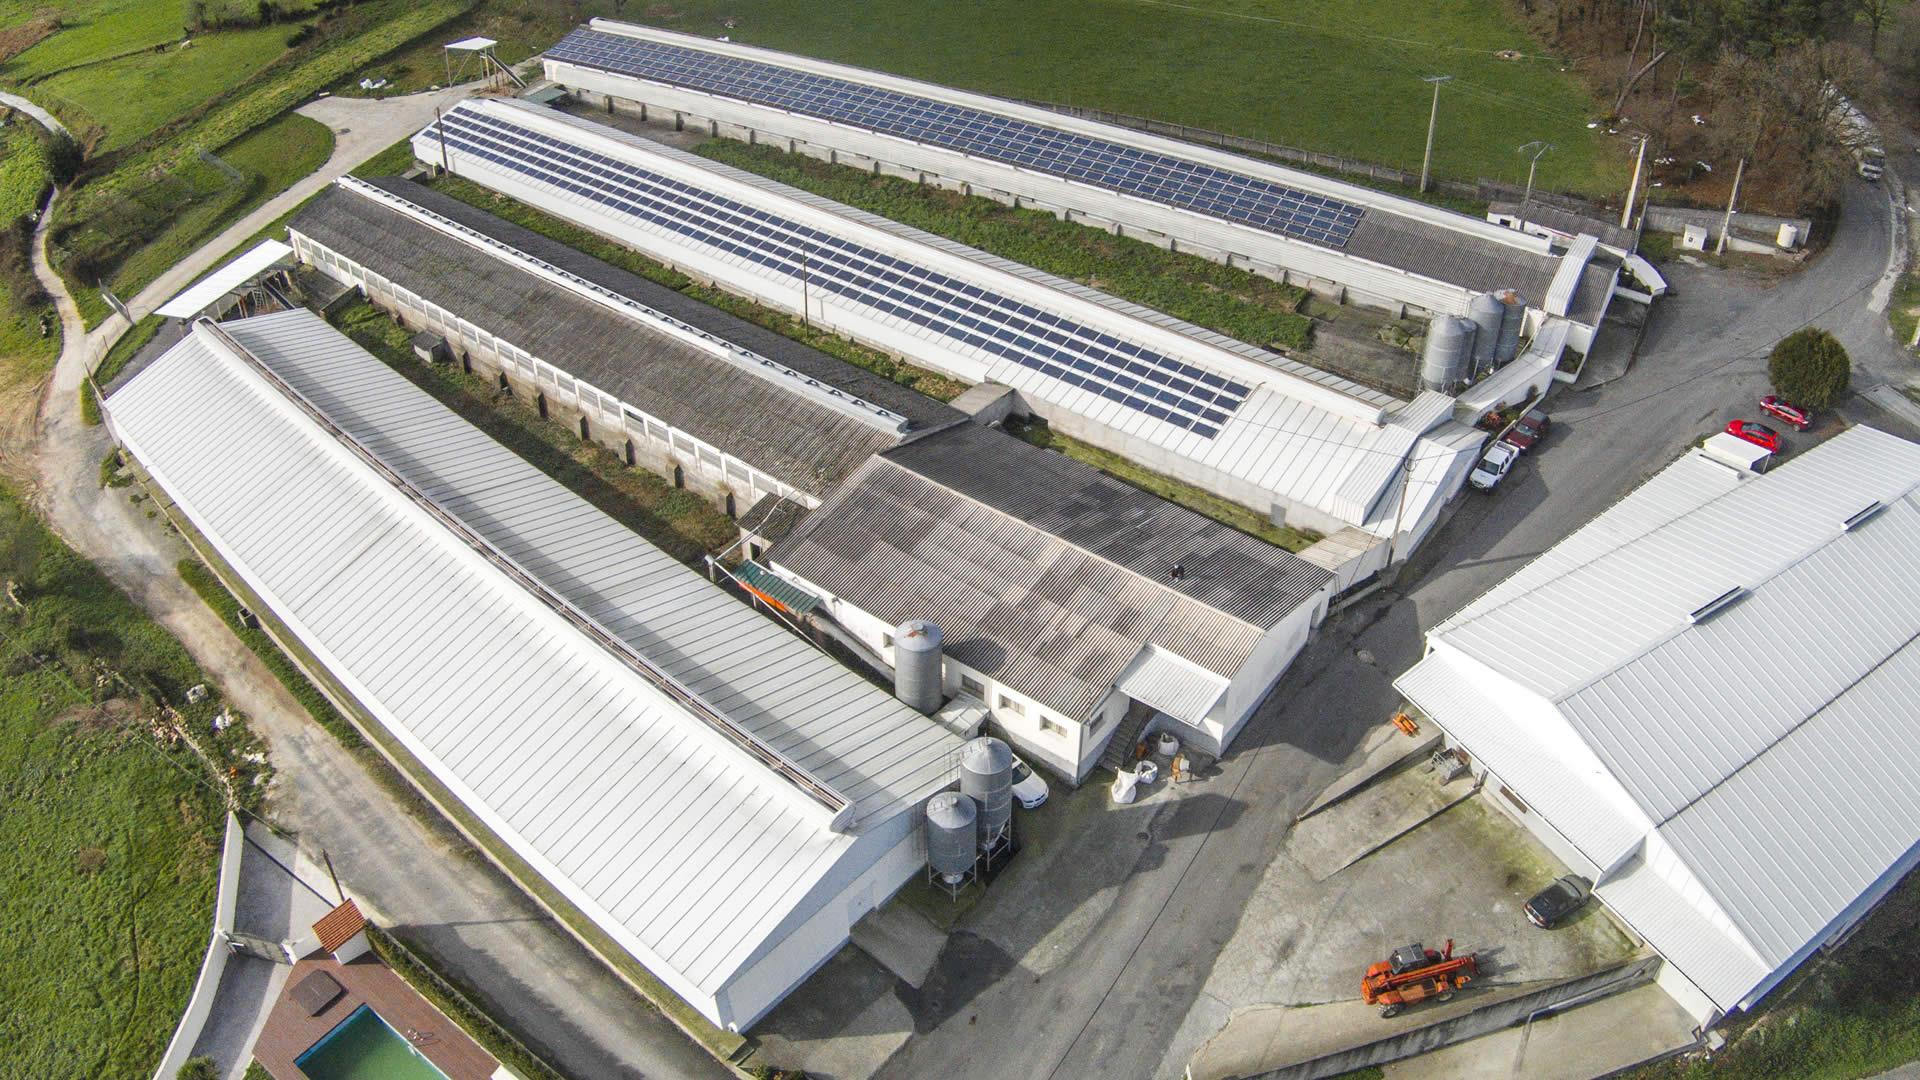 edf-solar-instalacion-paneles-solares-granja-campomayor-1